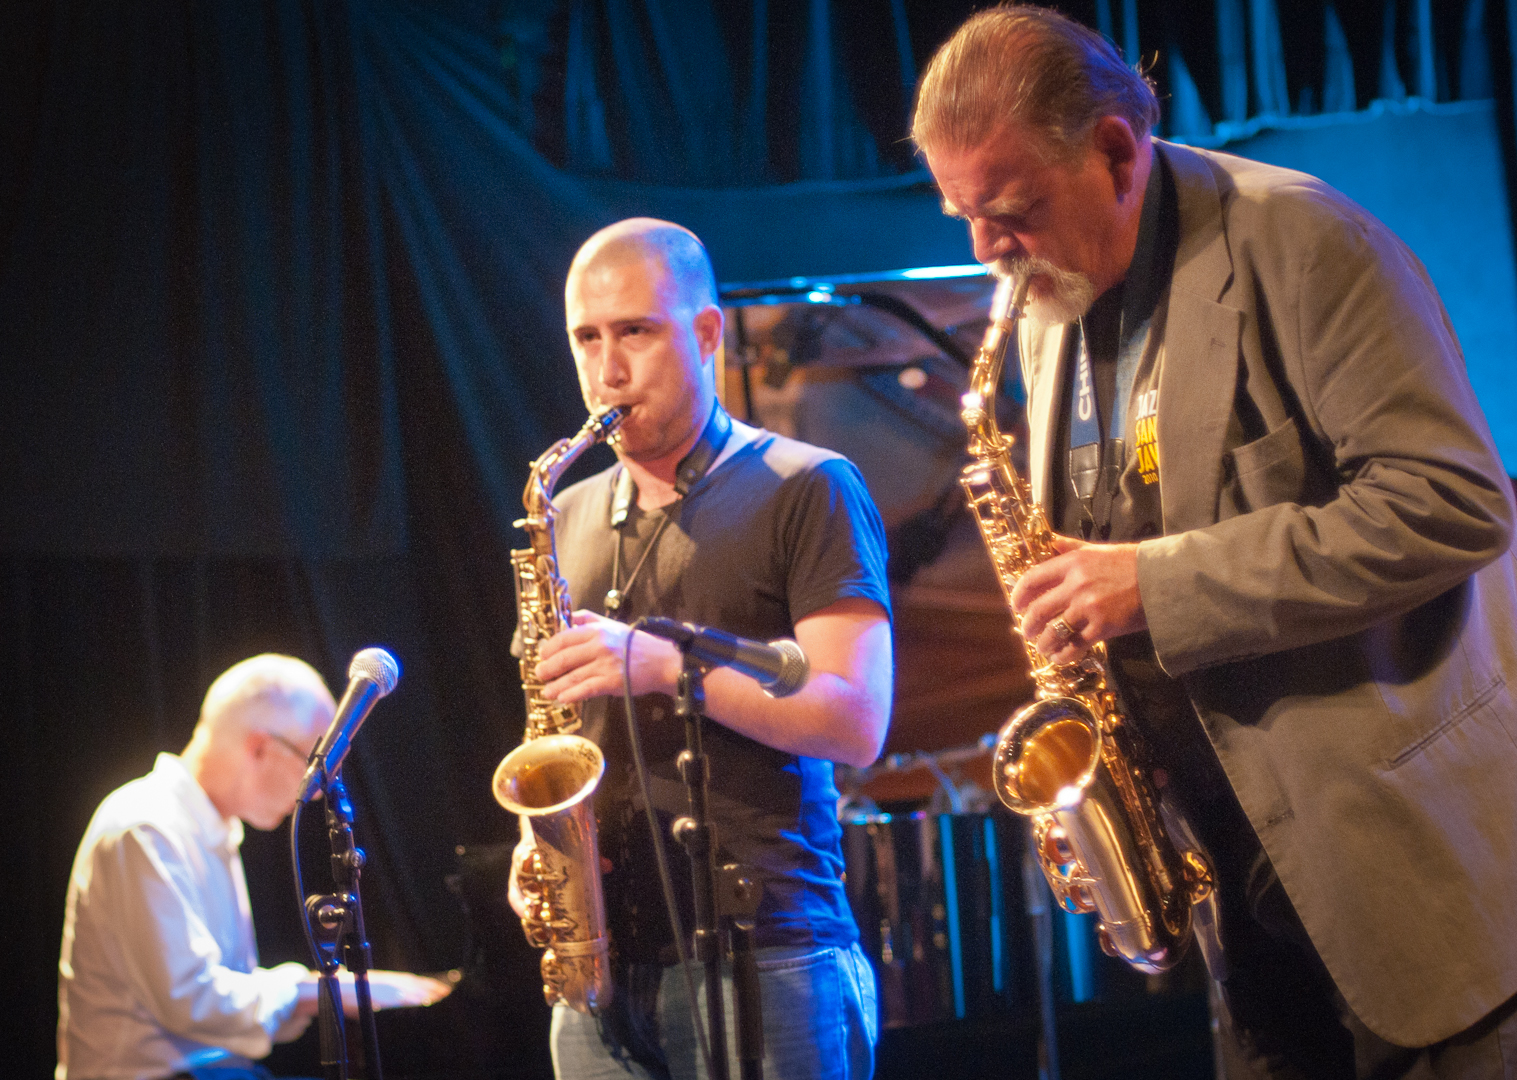 Rune Klakegg, Guy Sion and Bernt Brinck-Johnsen at the Oslo Jazz Festival Jam Sessions